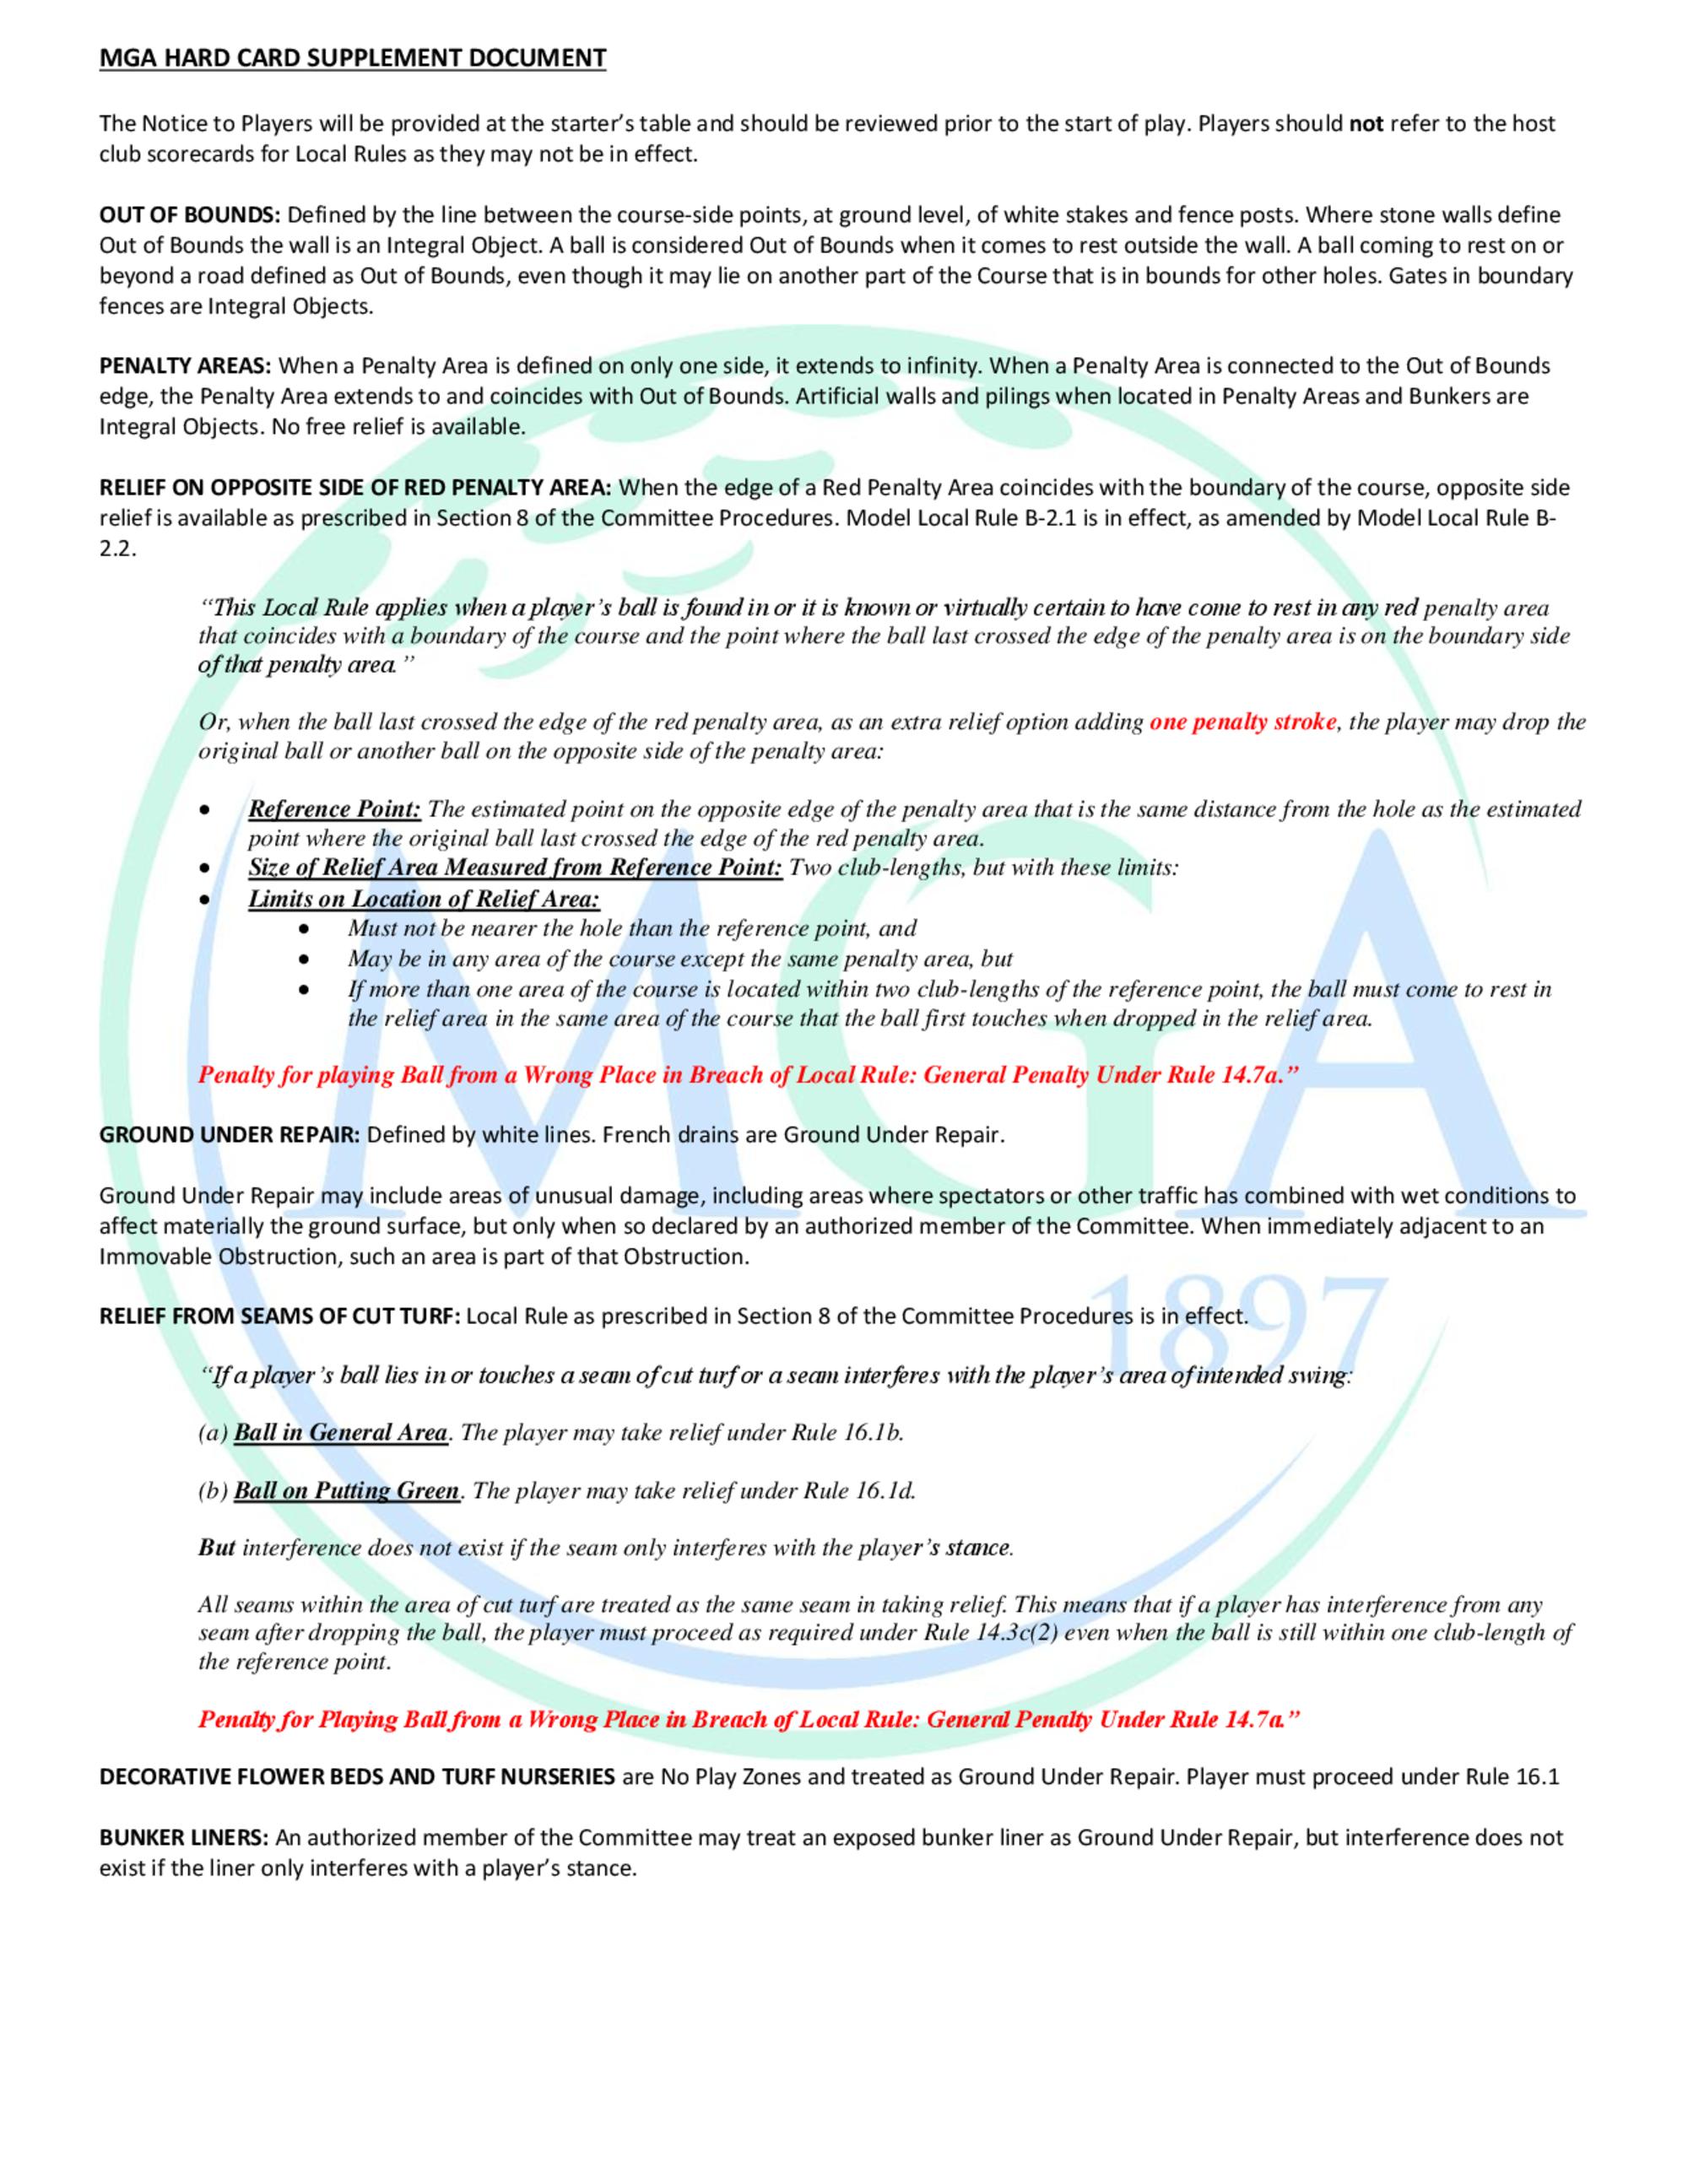 Mga hard card supplement document  1